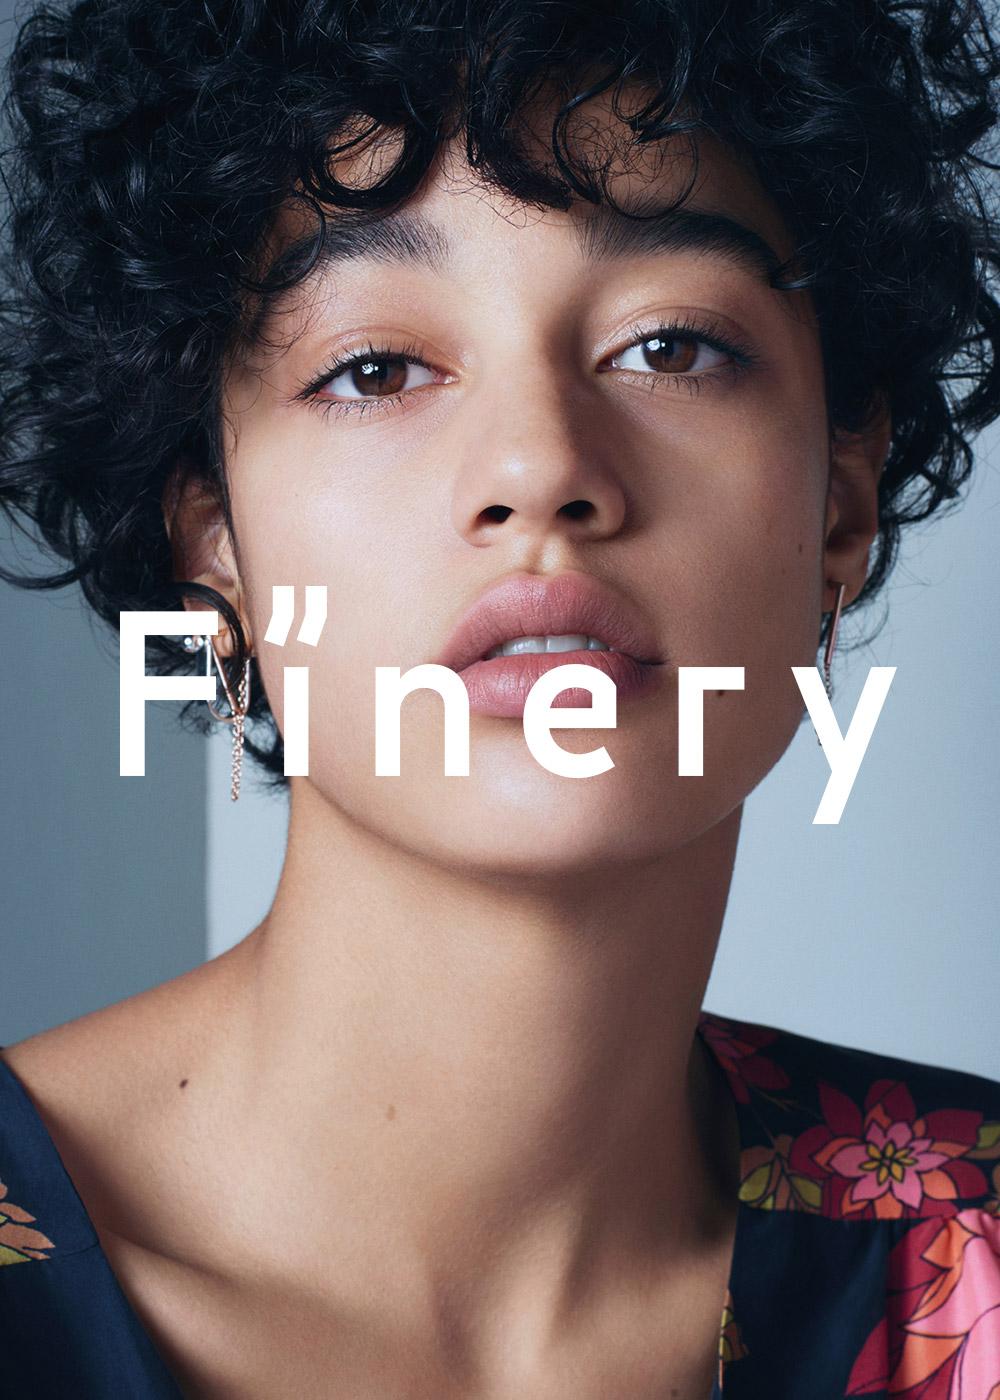 Friederike-Hamann-Finery-Campaign-11.jpg